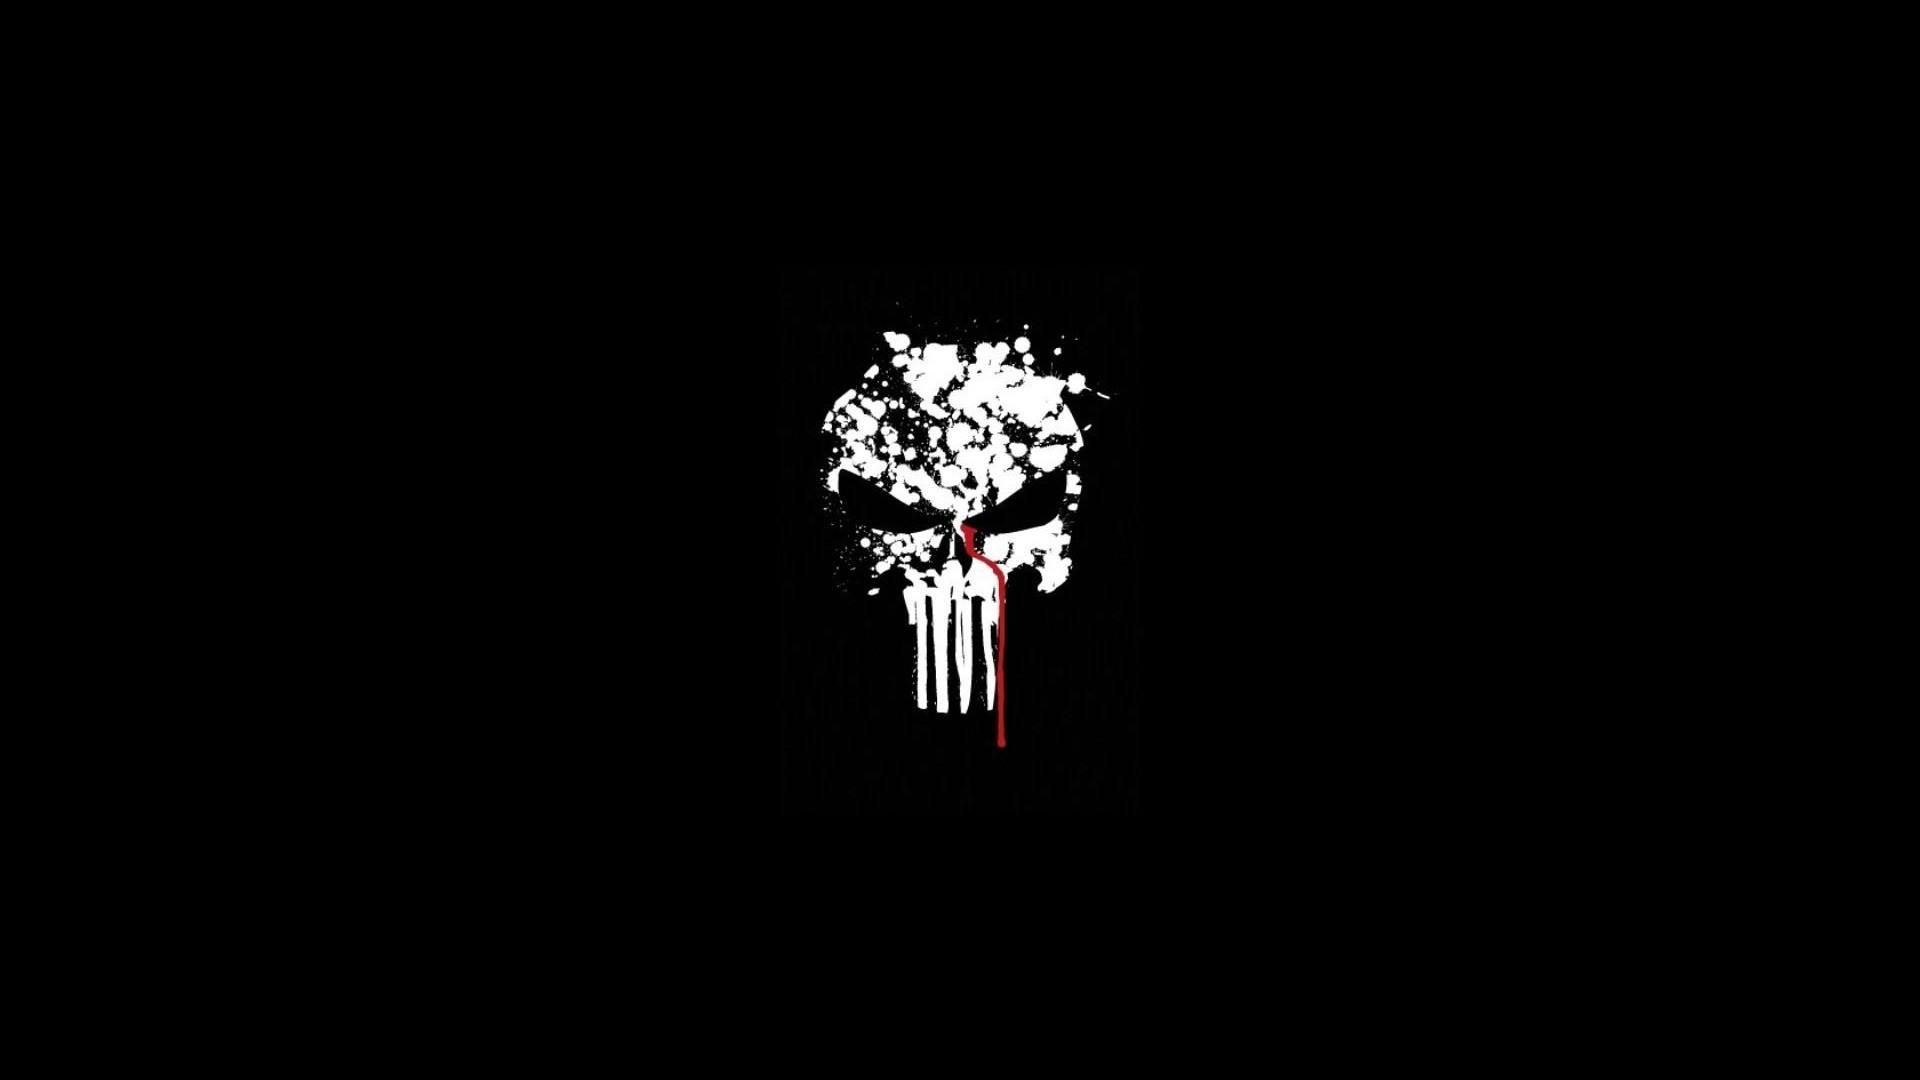 Punisher Skull Images   Crazy Gallery